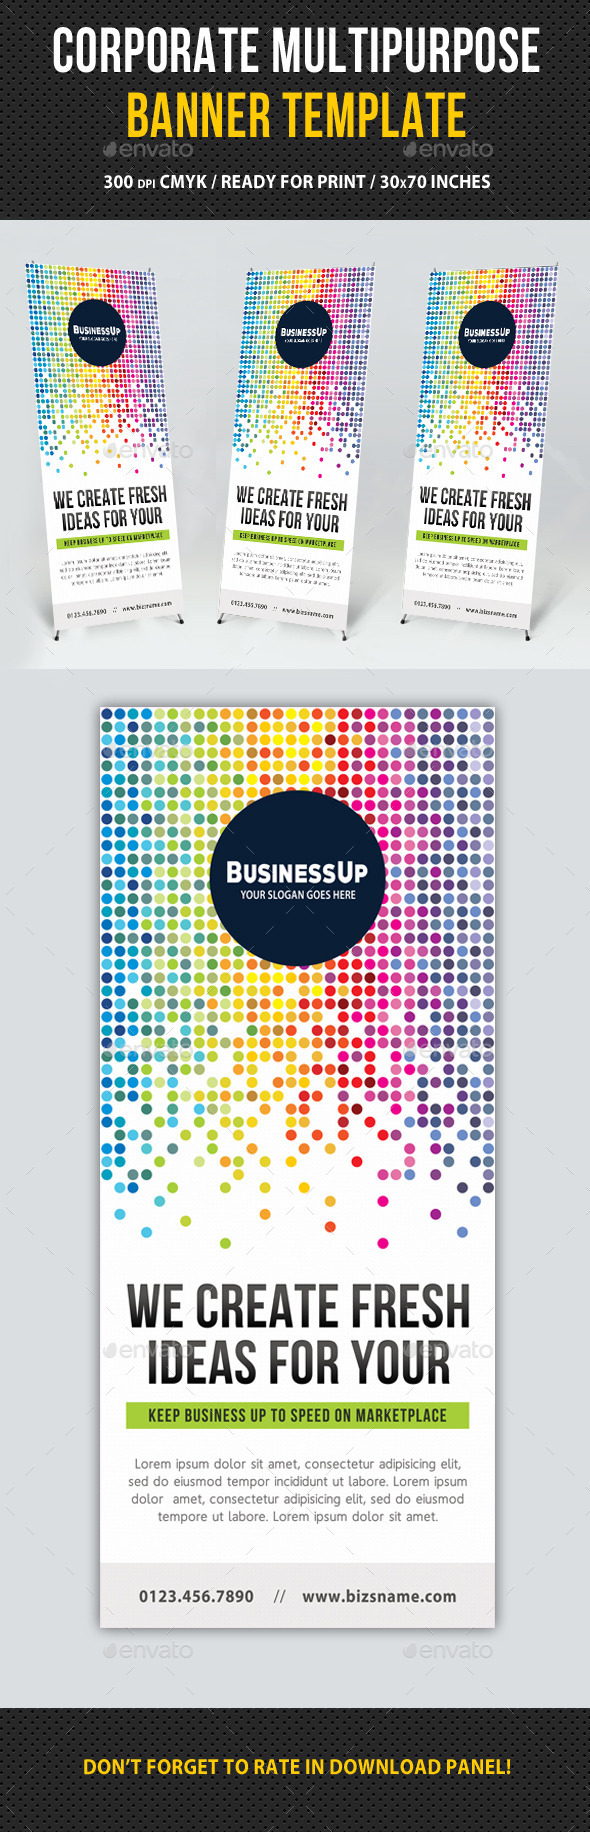 Multipurpose Banner Template V06 - Signage Print Templates